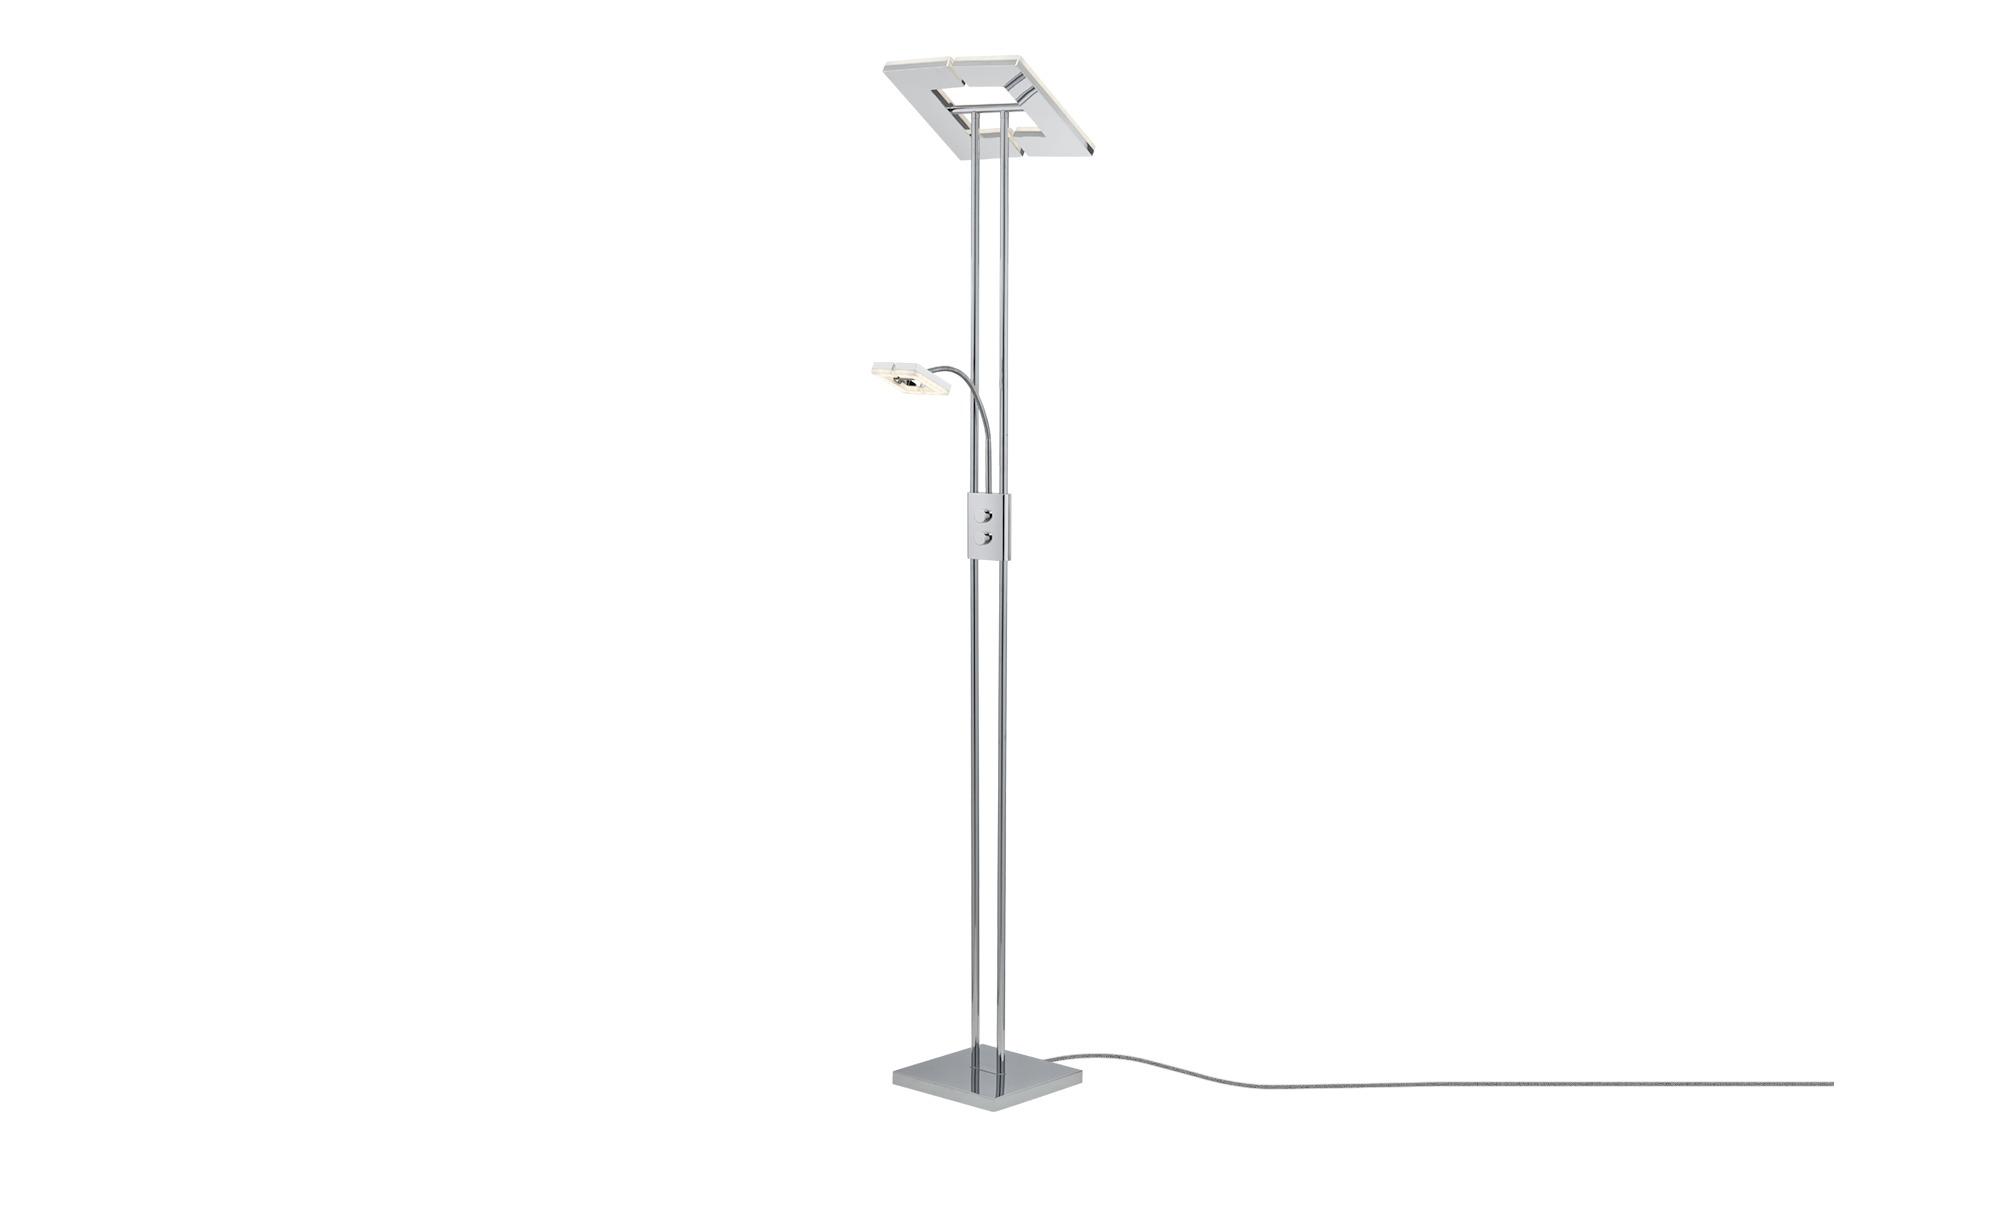 Paul Sommerkamp Leuchten LED-Deckenfluter, 2-flammig Chrom ¦ Maße (cm): B: 28,5 H: 181 Lampen & Leuchten > Innenleuchten > Stehlampen - Höffner | Lampen > Stehlampen > Deckenfluter | Möbel Höffner DE